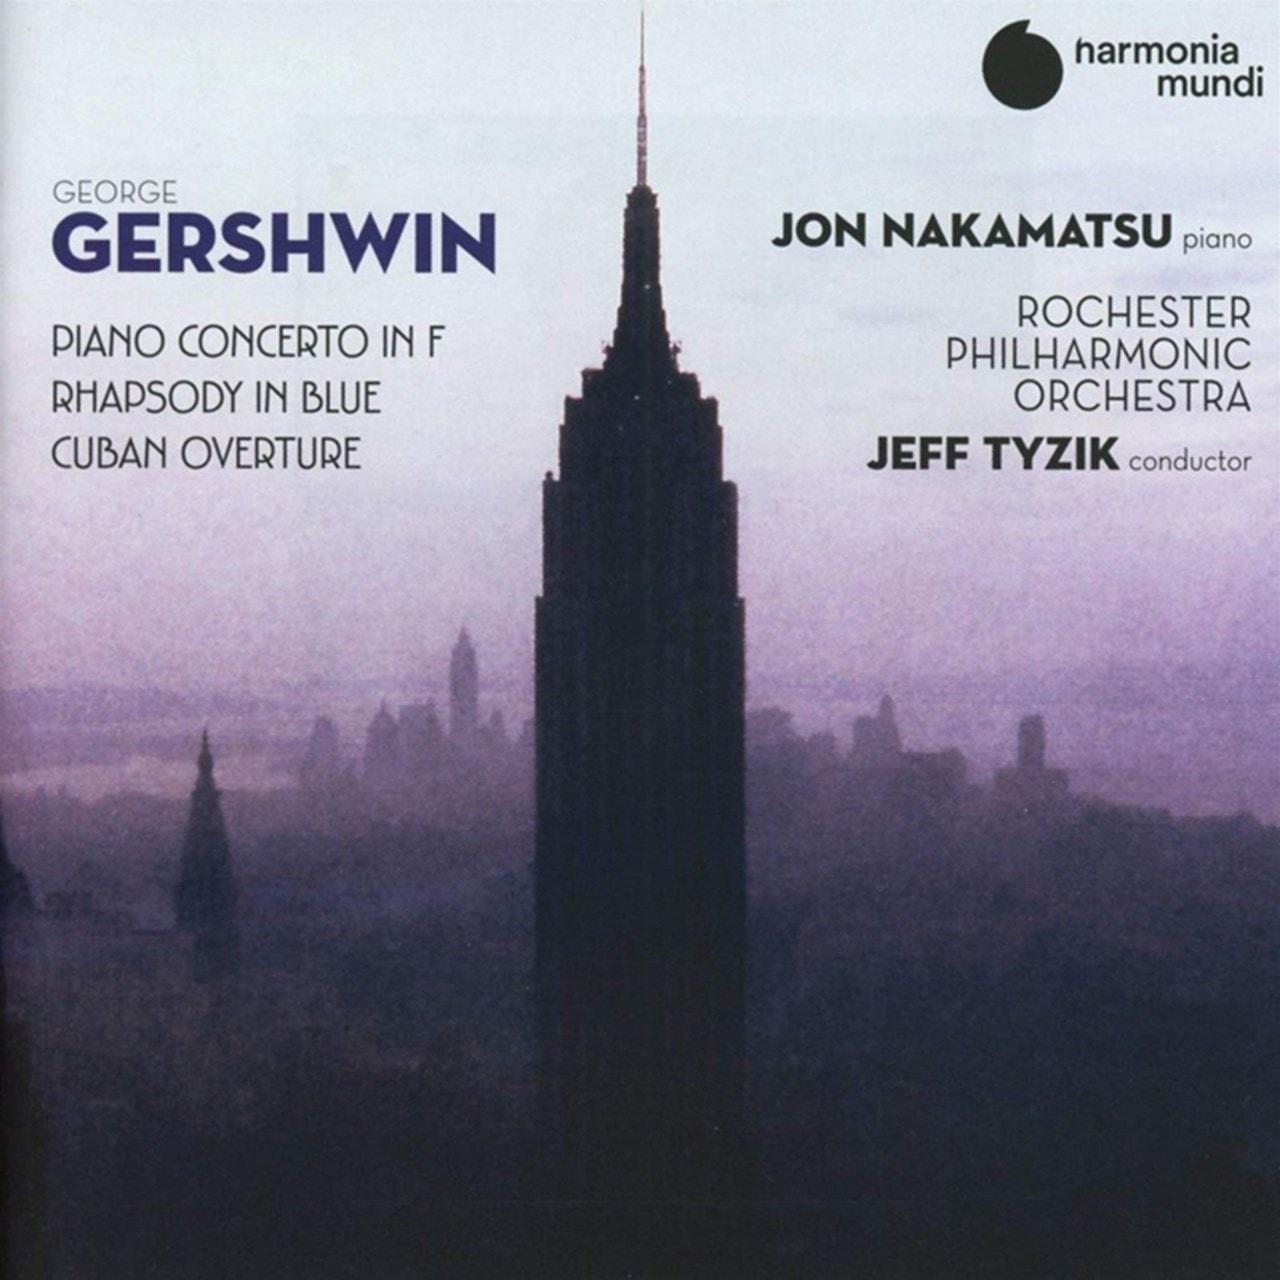 George Gershwin: Piano Concerto in F/Rhapsody in Blue/... - 1